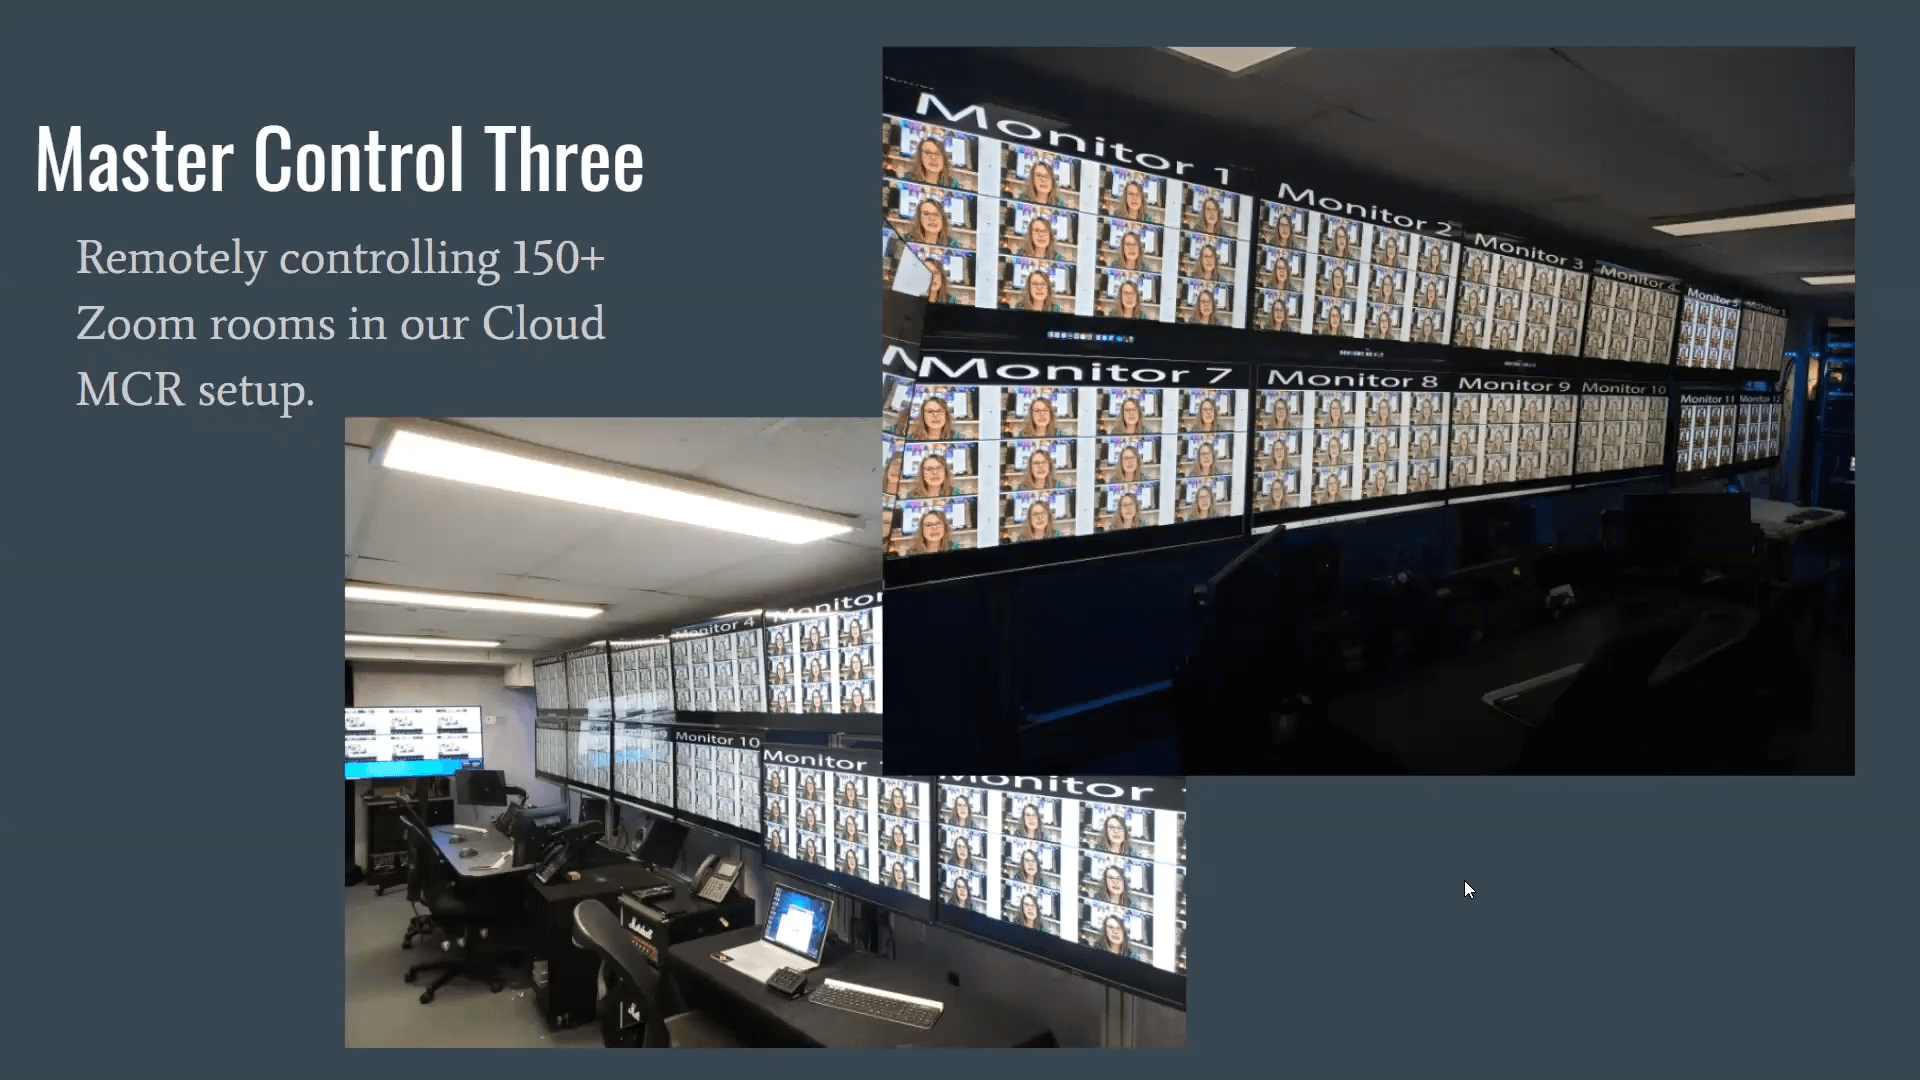 LiveSports Master Control Three